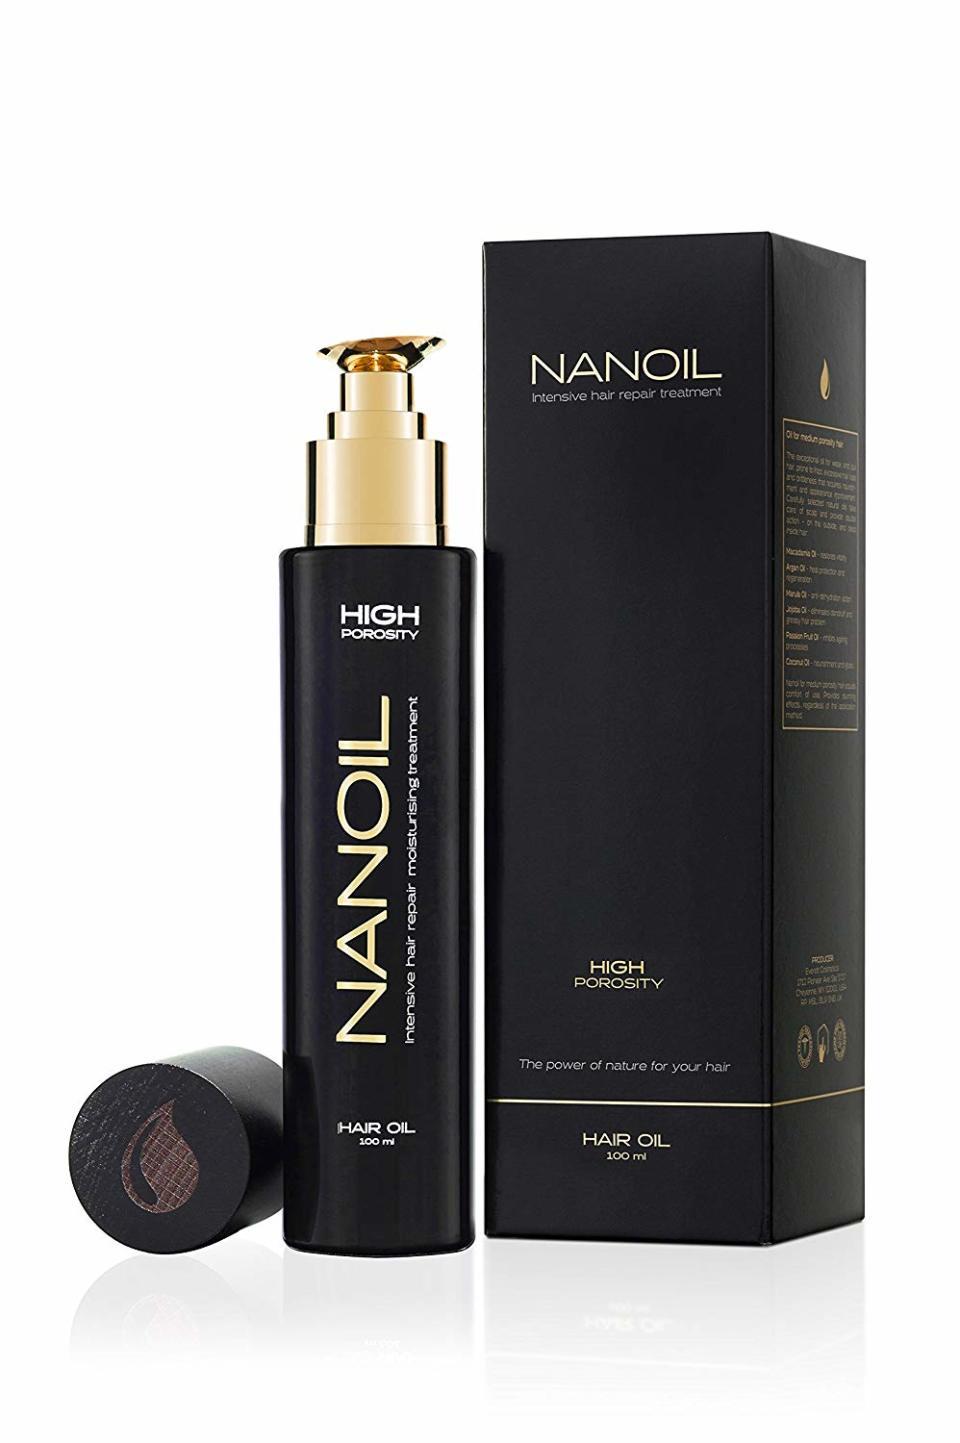 Haaröl Nanoil für hohe Porosität